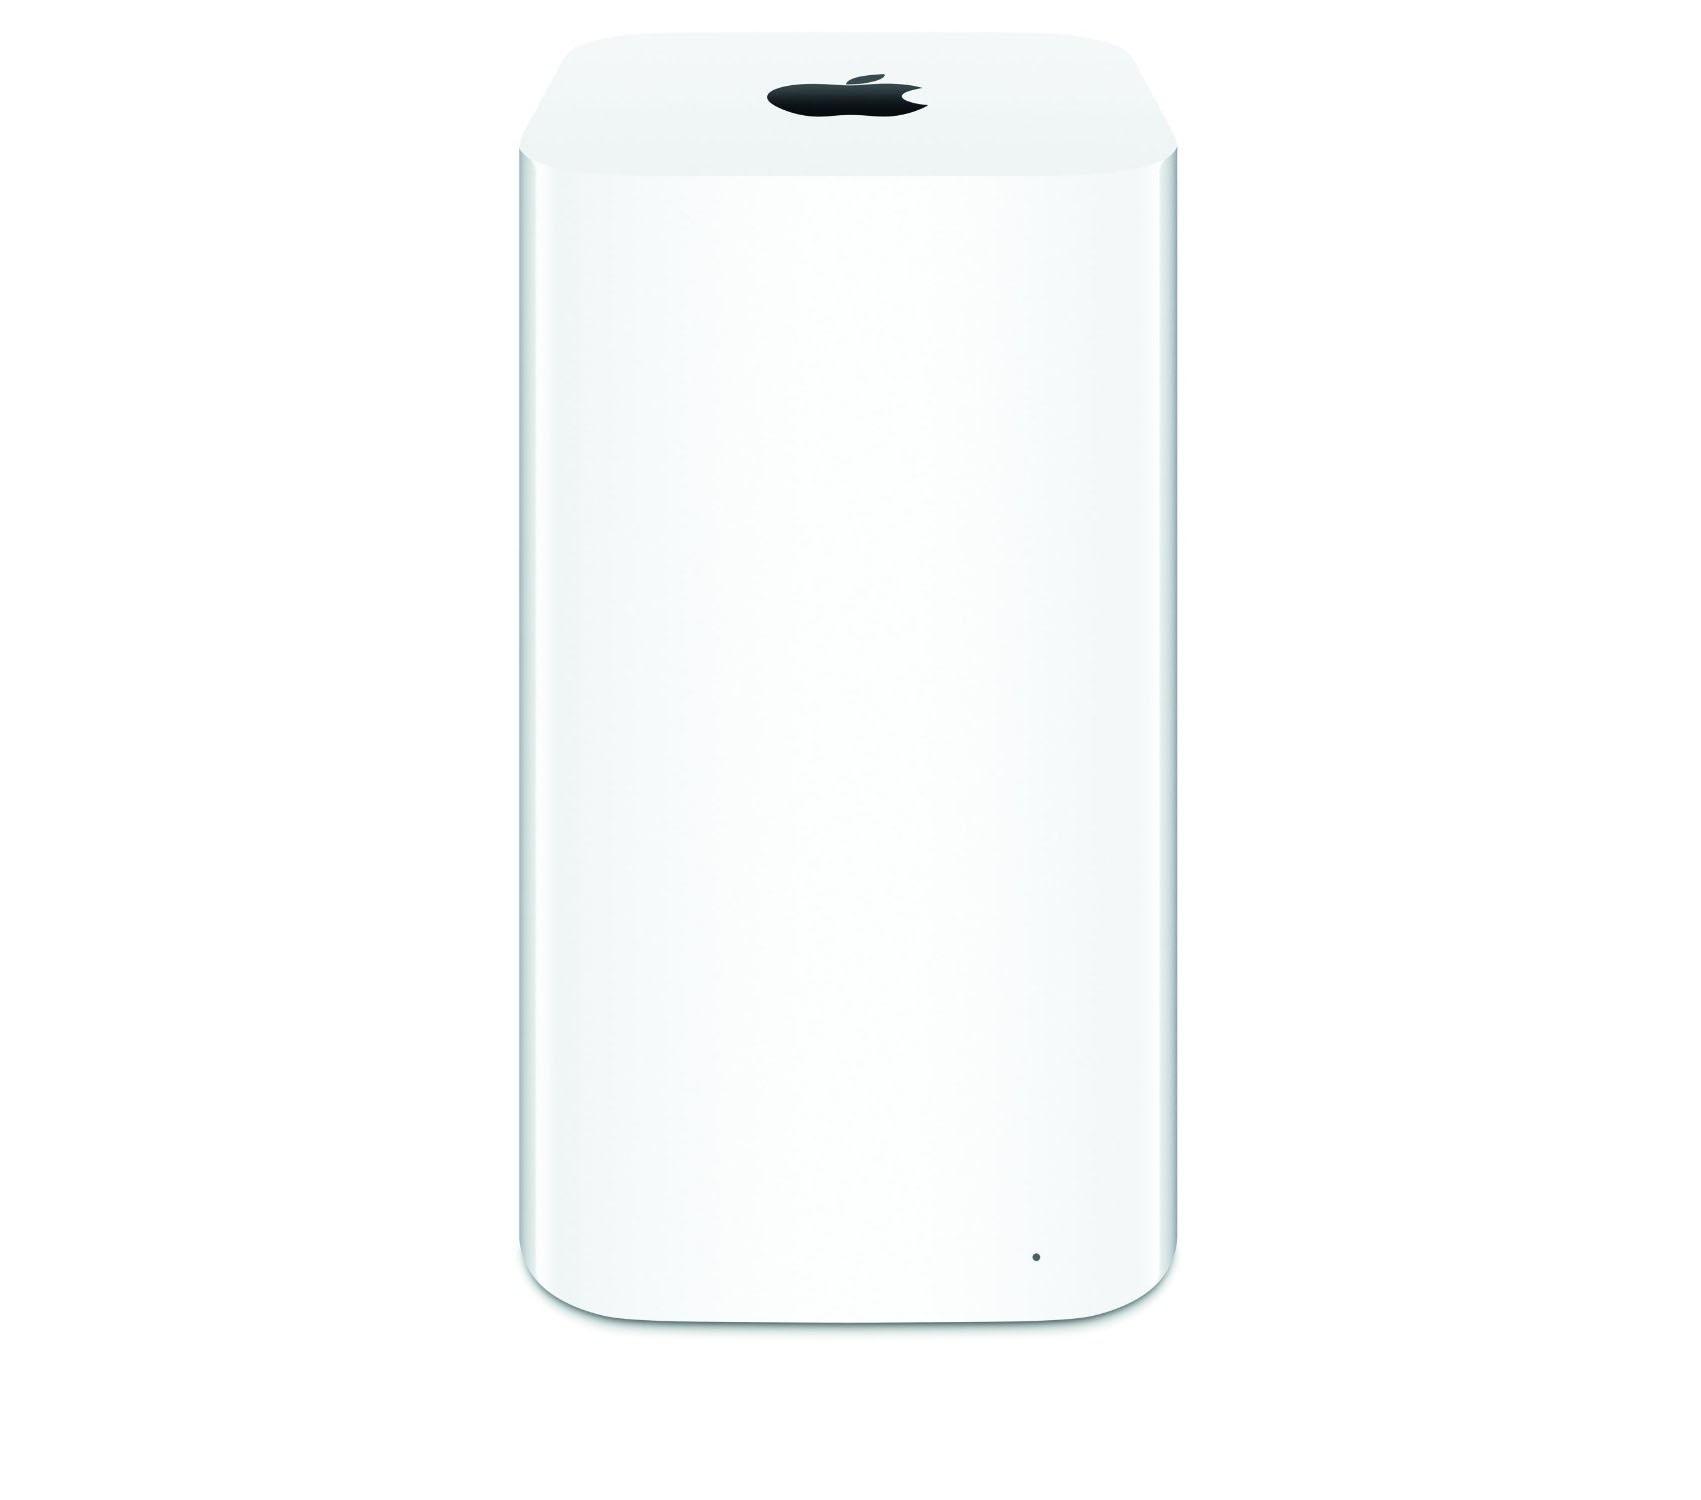 macbook accessories, macbook pro accessories, macbook air accessories, laptop accessories